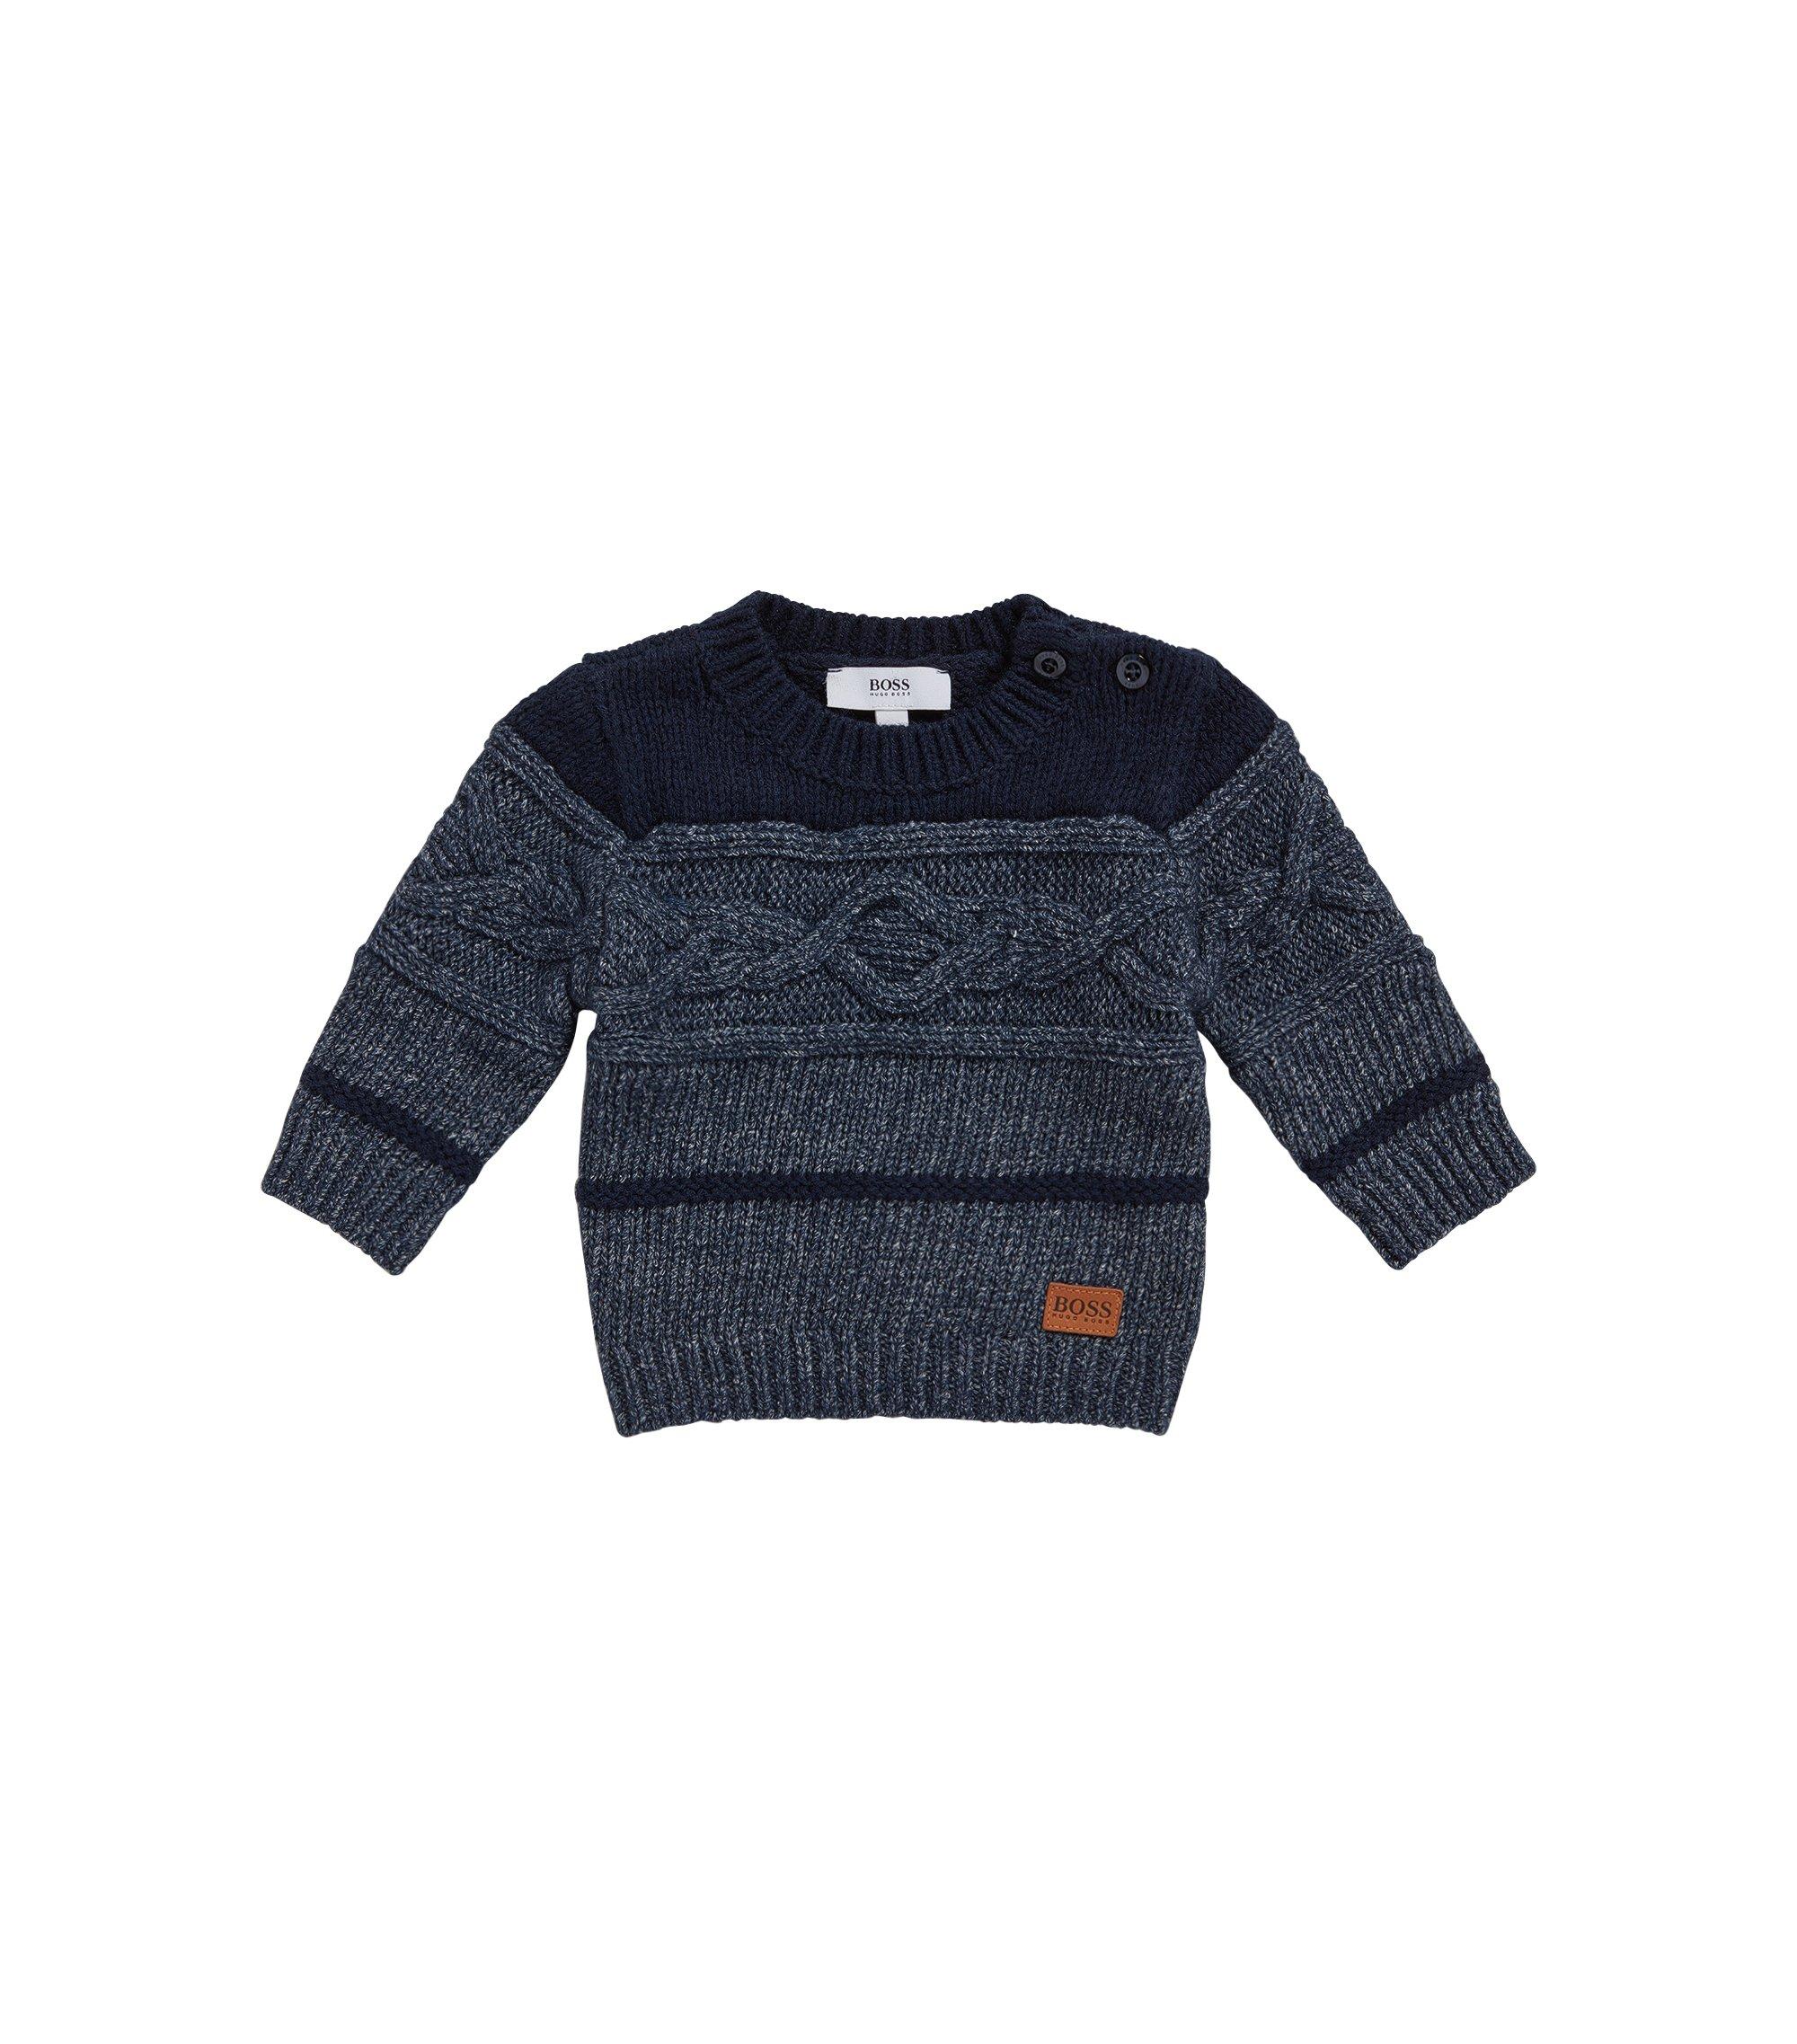 'J05516' | Toddler Stretch Cotton Blend Patterned Sweater, Dark Blue